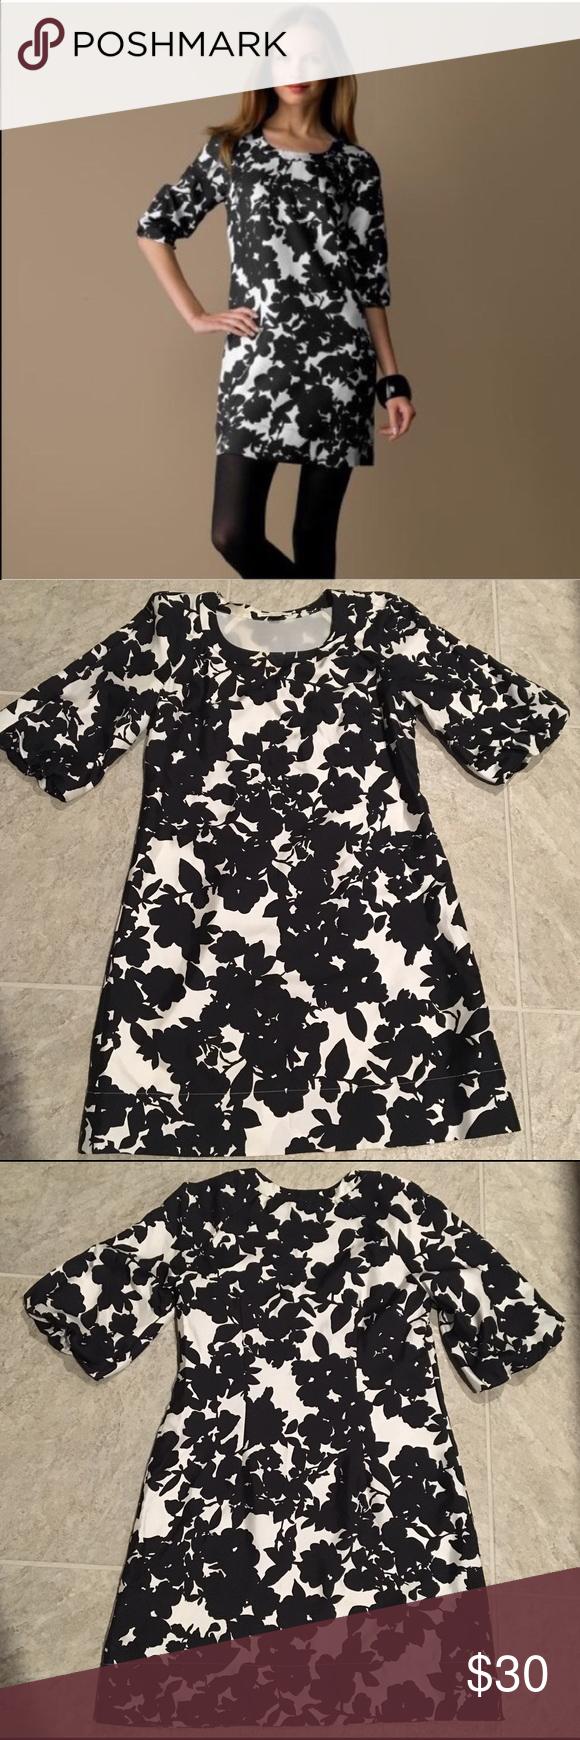 Banana Republic Silk Dress Black floral shift dress. Size small. Excellent condition. Never worn. Banana Republic Dresses